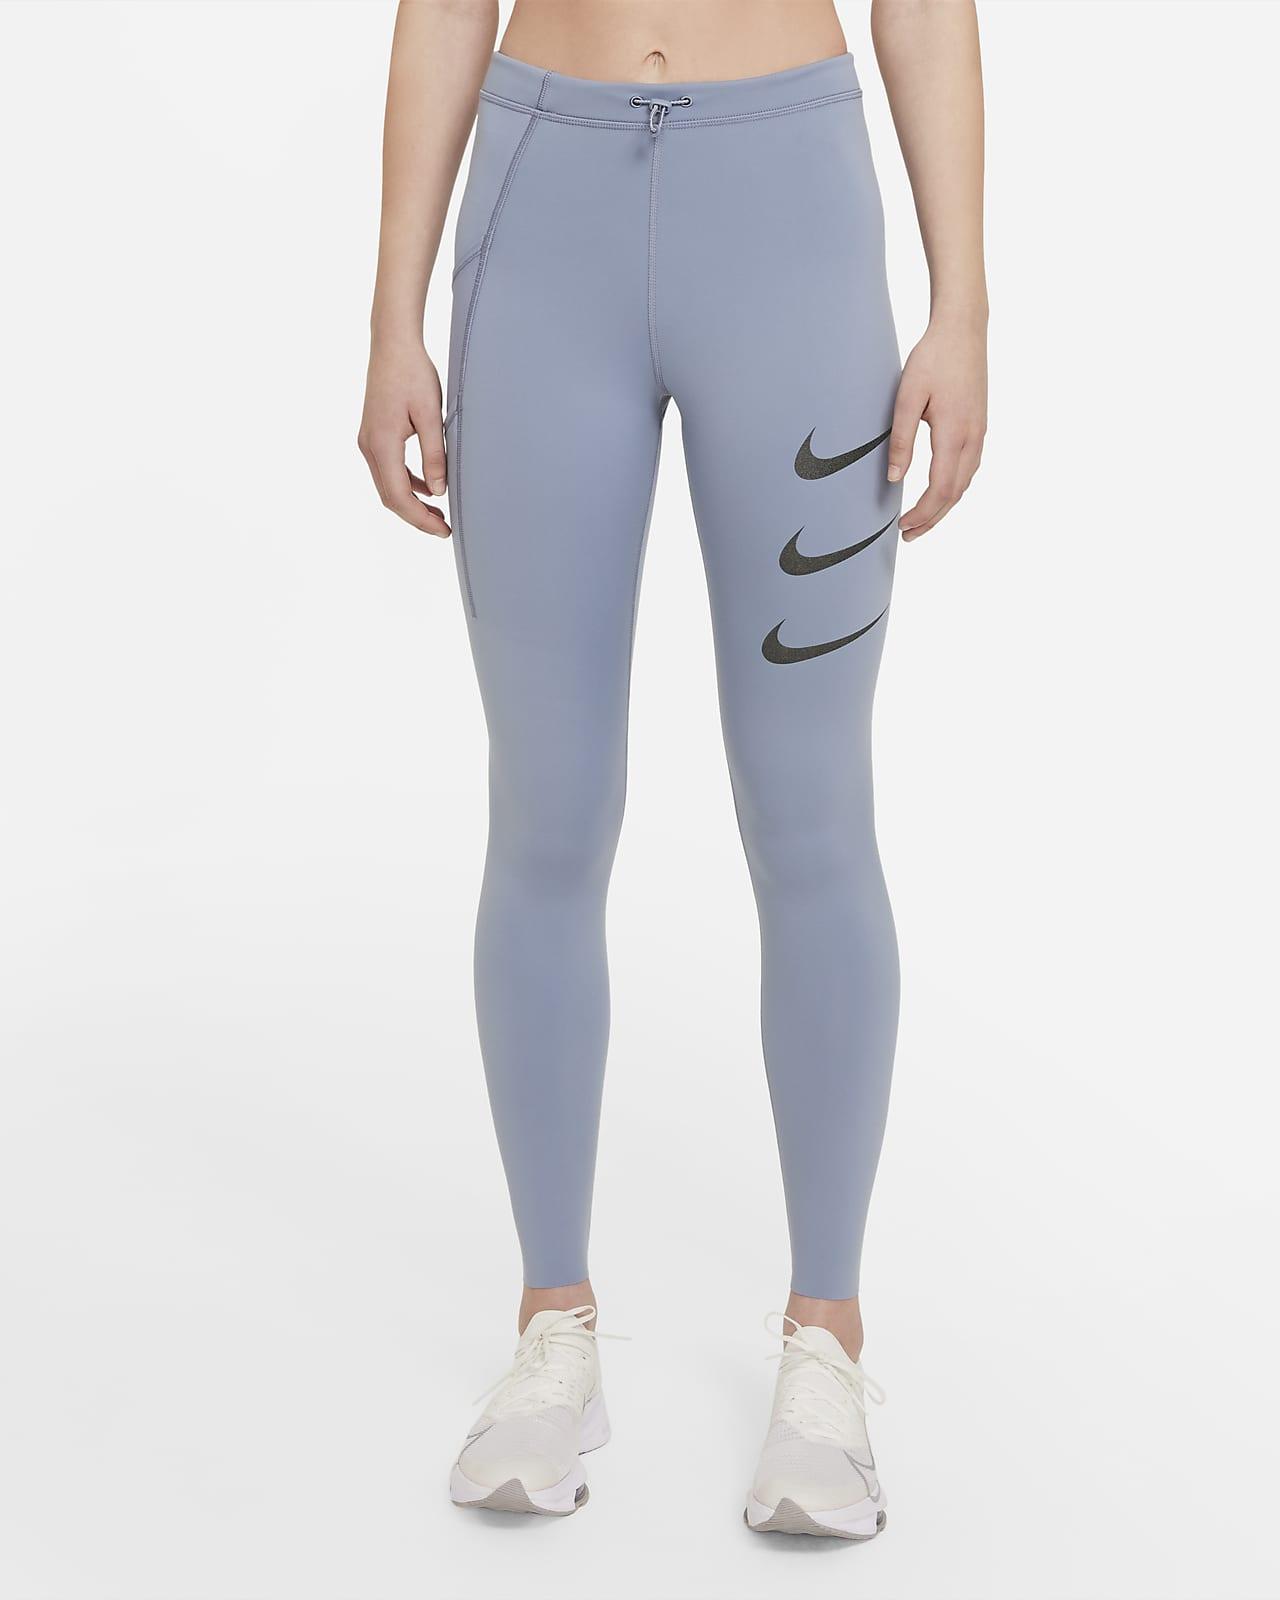 Damskie legginsy do biegania ze średnim stanem Nike Epic Luxe Run Division